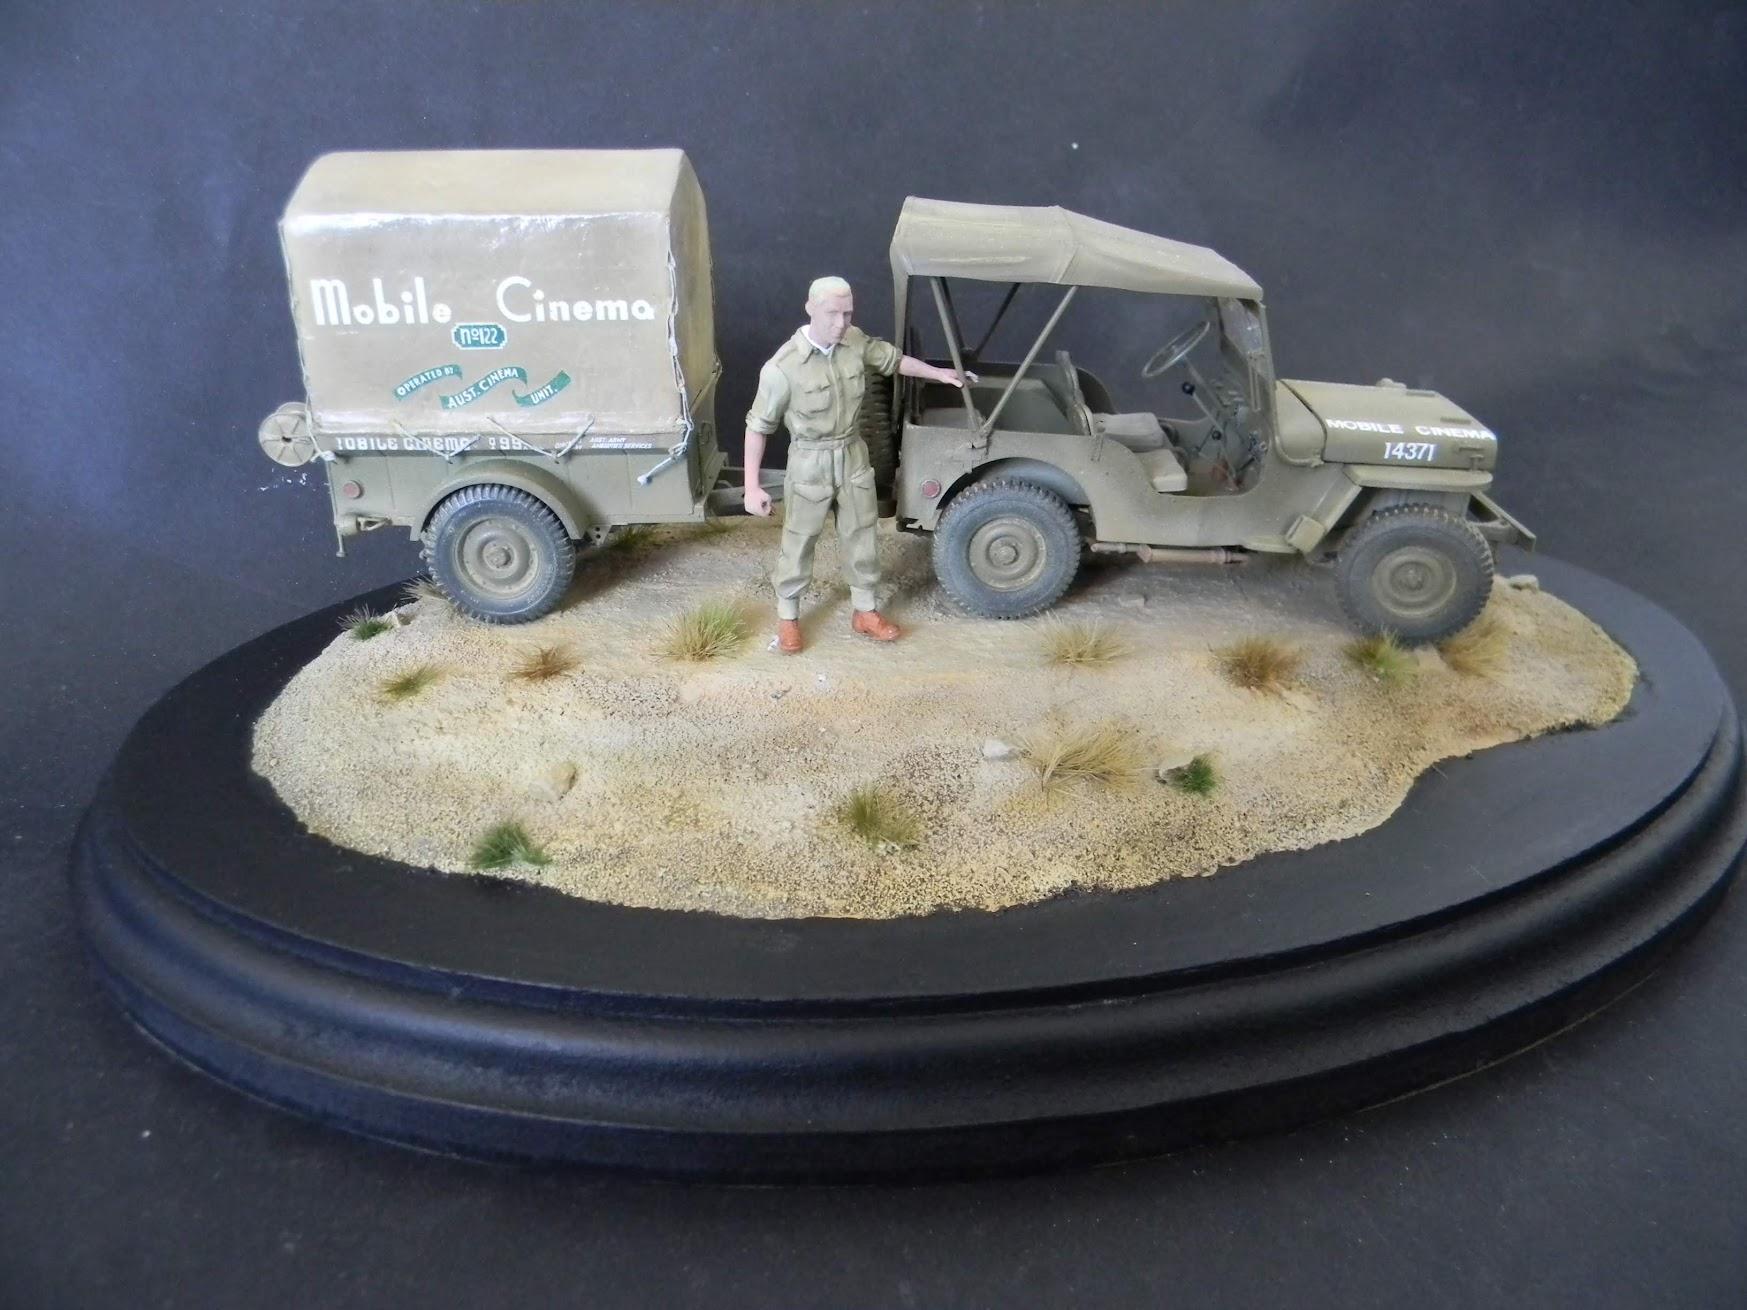 GPW 1942 Ford Bronco Model : revue de détail et montage - Page 5 6UdLIBOCAFEwfpBlzBjTGOvF0Wgvre1LcX8jfIkvNmeeJLL1UhPG_KWDE_MYMDqCd-h5MH30-ffUCLxoqikW2itxS8-jVdpJeh6ehFC8ldbHqjC56dzjfyNwOxDibzmMJAeS8K-Y7M_szntIWH3Jcx7wscGJtDqRpDxkWeczi5X-af9376R4uAz0fwURMxIJds4dY-V2JRxIxmHxNZJ_M4Ab6wdpIbmTqlTdkVu32o15lBqWCxEwh1R7eZ_8JR2x3NVCZfsxG-VipcAnaAJAVwvKKoDNsYHC_l9w6r1LmC5Ok4n3Gzd3ku_V4v0ONWd5luw77jbv1jRcouDMfiPnNX7lzXhJHyEuf8Lk13O4U0MgXvmVjI7fdE2hR7SC-BOkjn6Ym4Mr7cp8AevqKVYRUSiicSt0N28xOG2KAQ-SP13GhV3M7LLXuxxKR6I3jD94tN9oBN1KaAmhWDlk4A924XcBUjerFcuq69BkoV4Ae8mibeYDHAoH15T9Rvpbc9CbGXTLEjcjYSs7wH1pEHEuBLZBcMECpIrkLVTDHmc9fLxTimn-VBa25TxQfY4sYWUJBewsw0iboXBNJ7rLdSPzPbQGW6le5v7lzRLm9uS0EFMXlC6PeGfTuQLGW7t3kAxq3RQZL9fHPQWOduyTjL8GfJ8TgGQVmvCOcQaQyRAHDUOJK0uZWFi1RTLNH9XozM6mry3tQv4PMVRxS3kwHAGvFamHRV2d-BRgOqHvSIpxoqf6VLHUbfOySamp=w1747-h1310-no